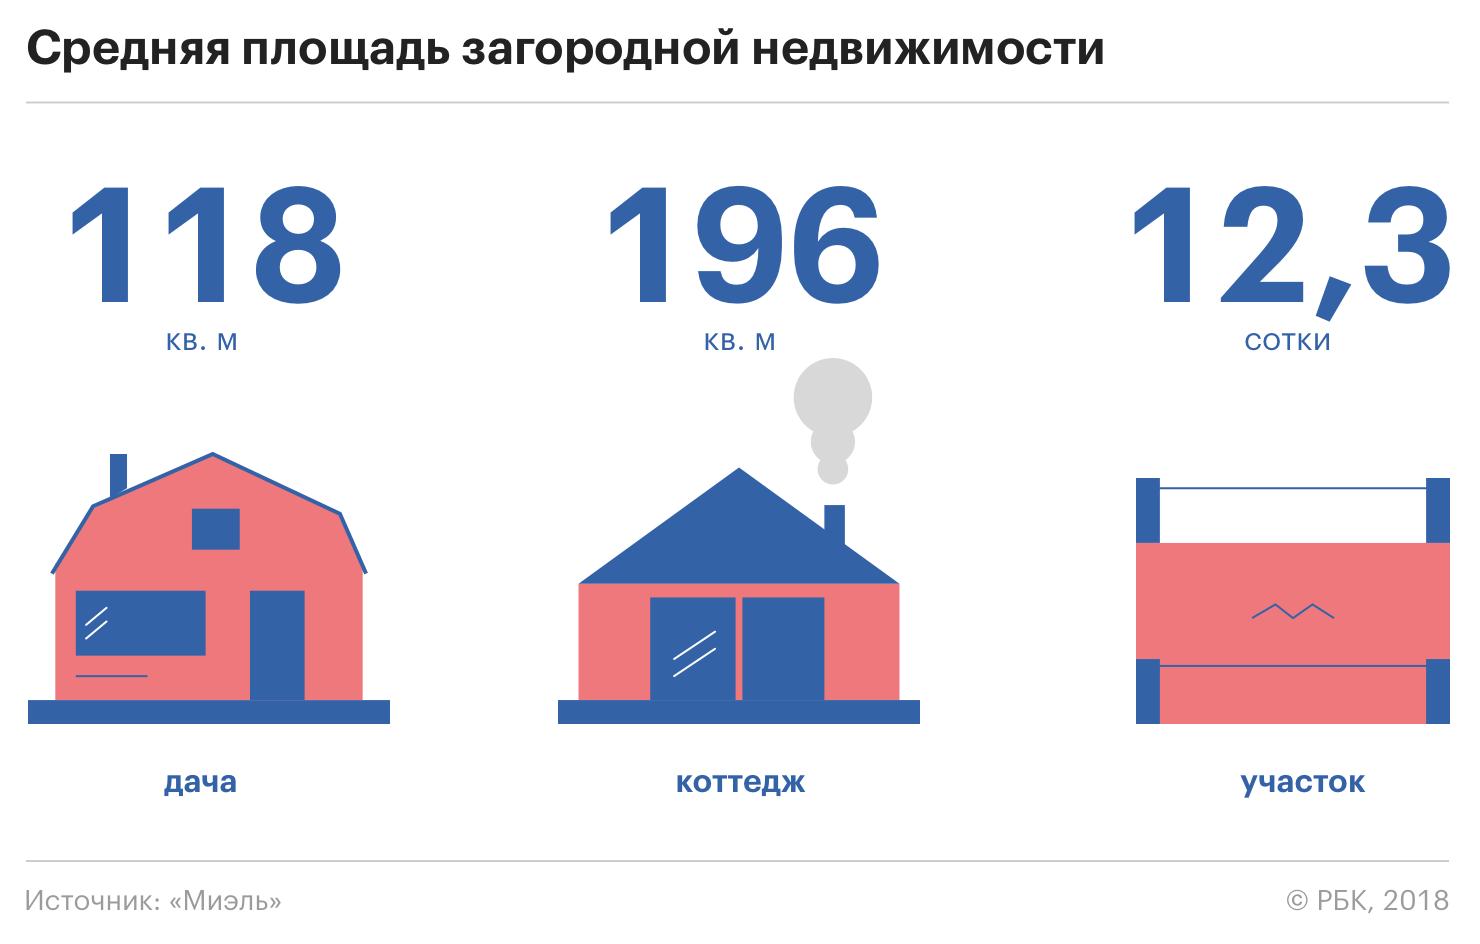 https://s0.rbk.ru/v6_top_pics/media/img/5/54/755371646794545.png